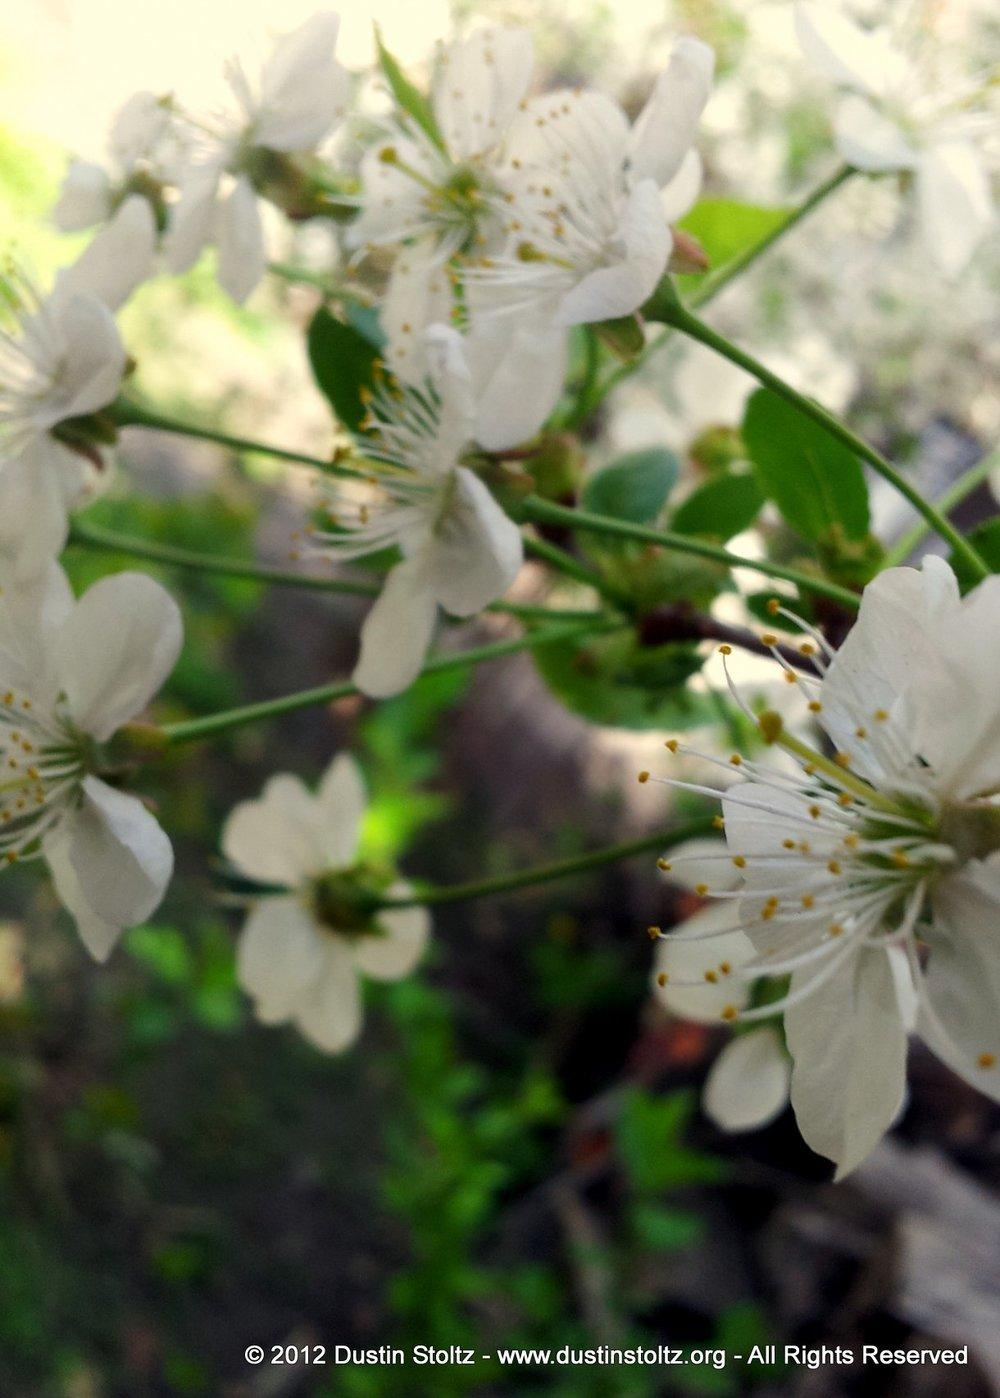 Flowering Trees in Zaqatala Rayon, Azerbaijan.